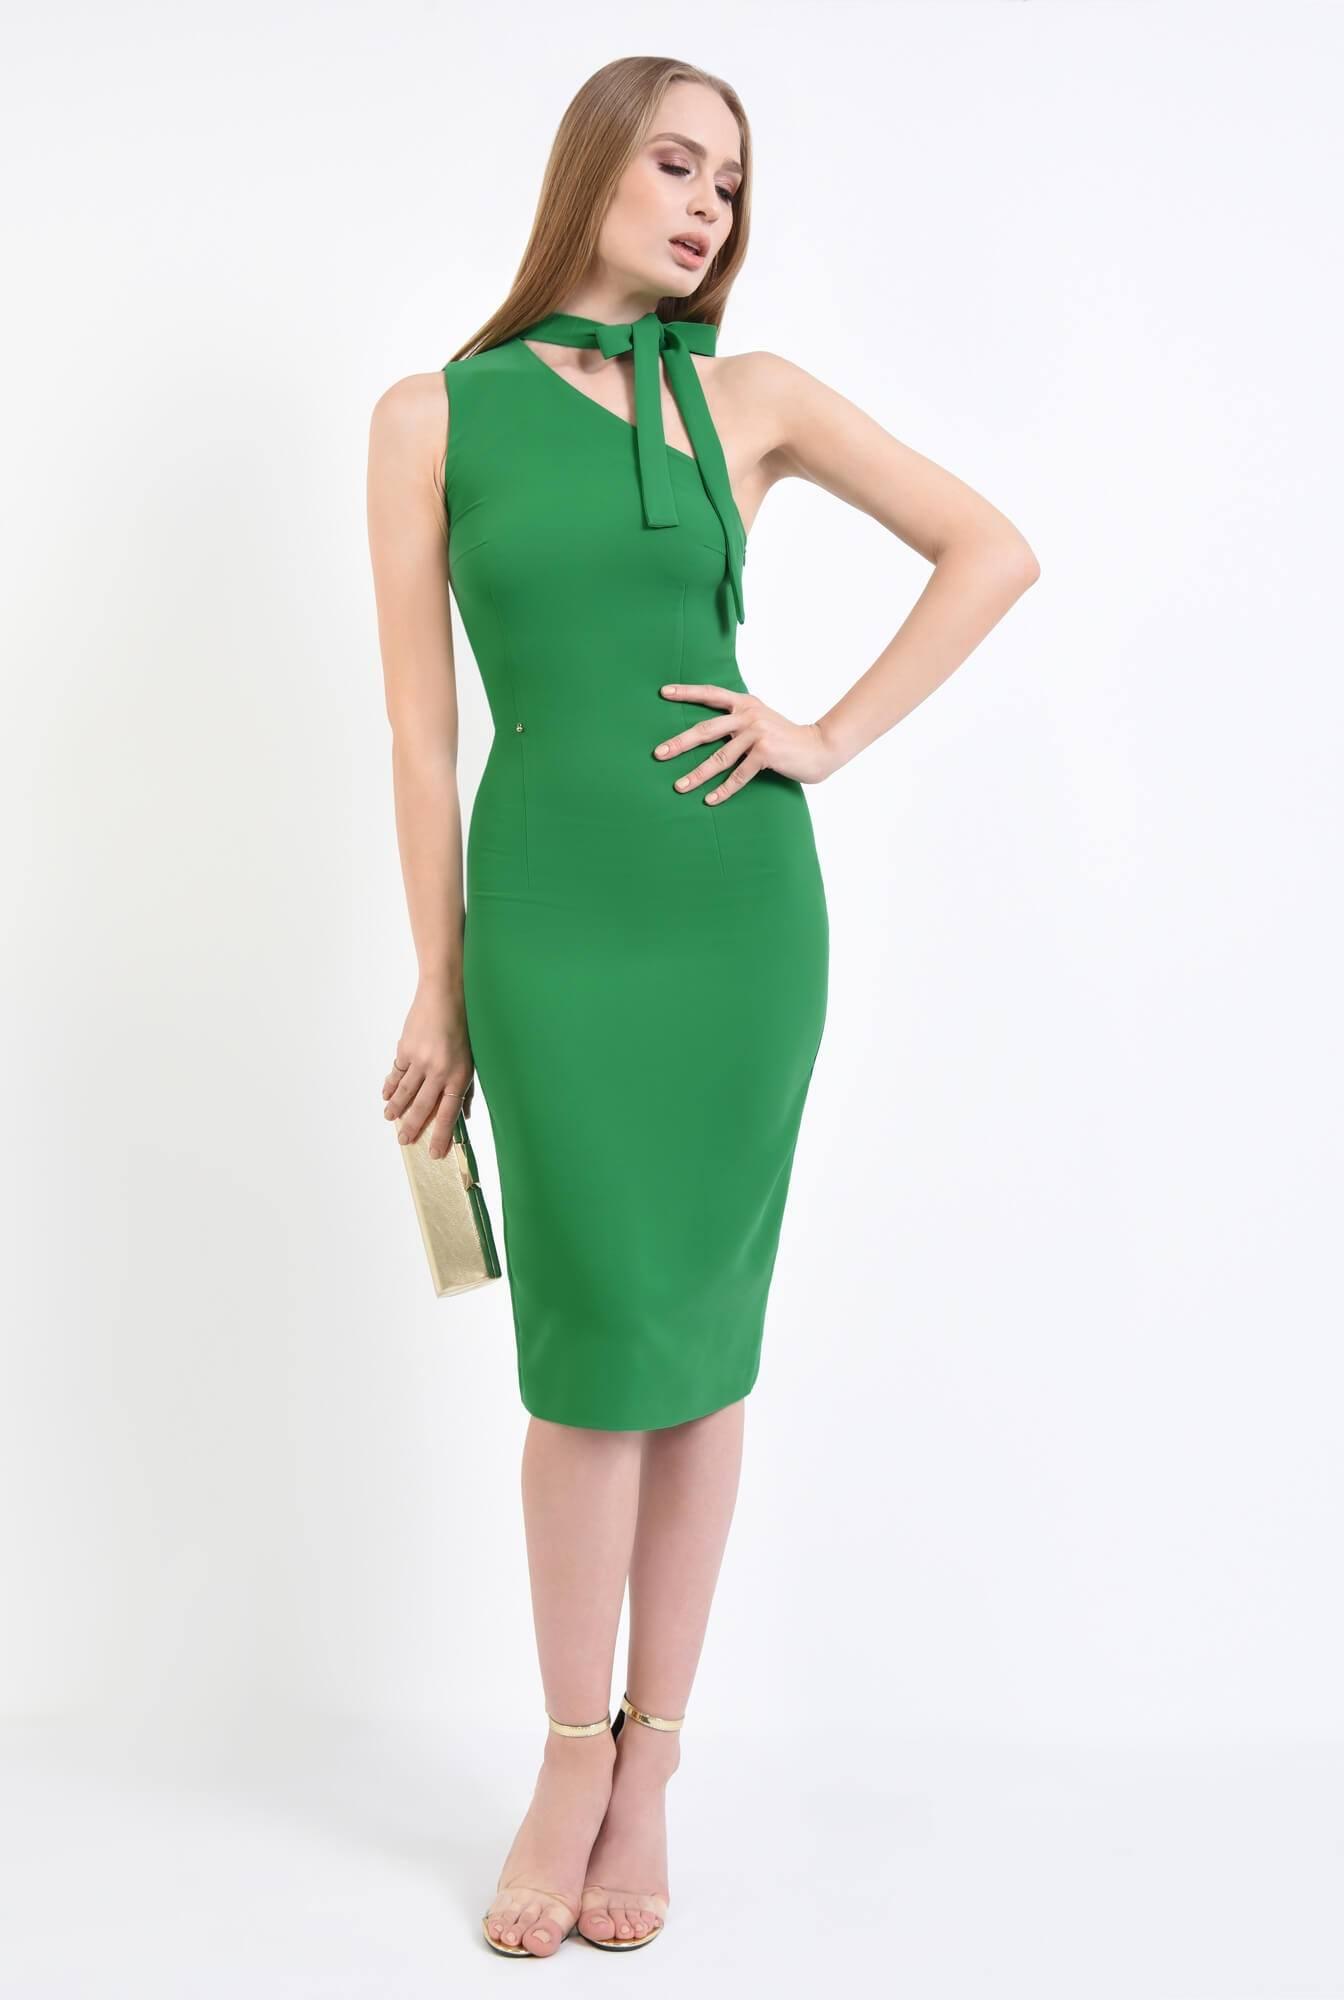 3 - Rochie verde, eleganta, cu umar gol